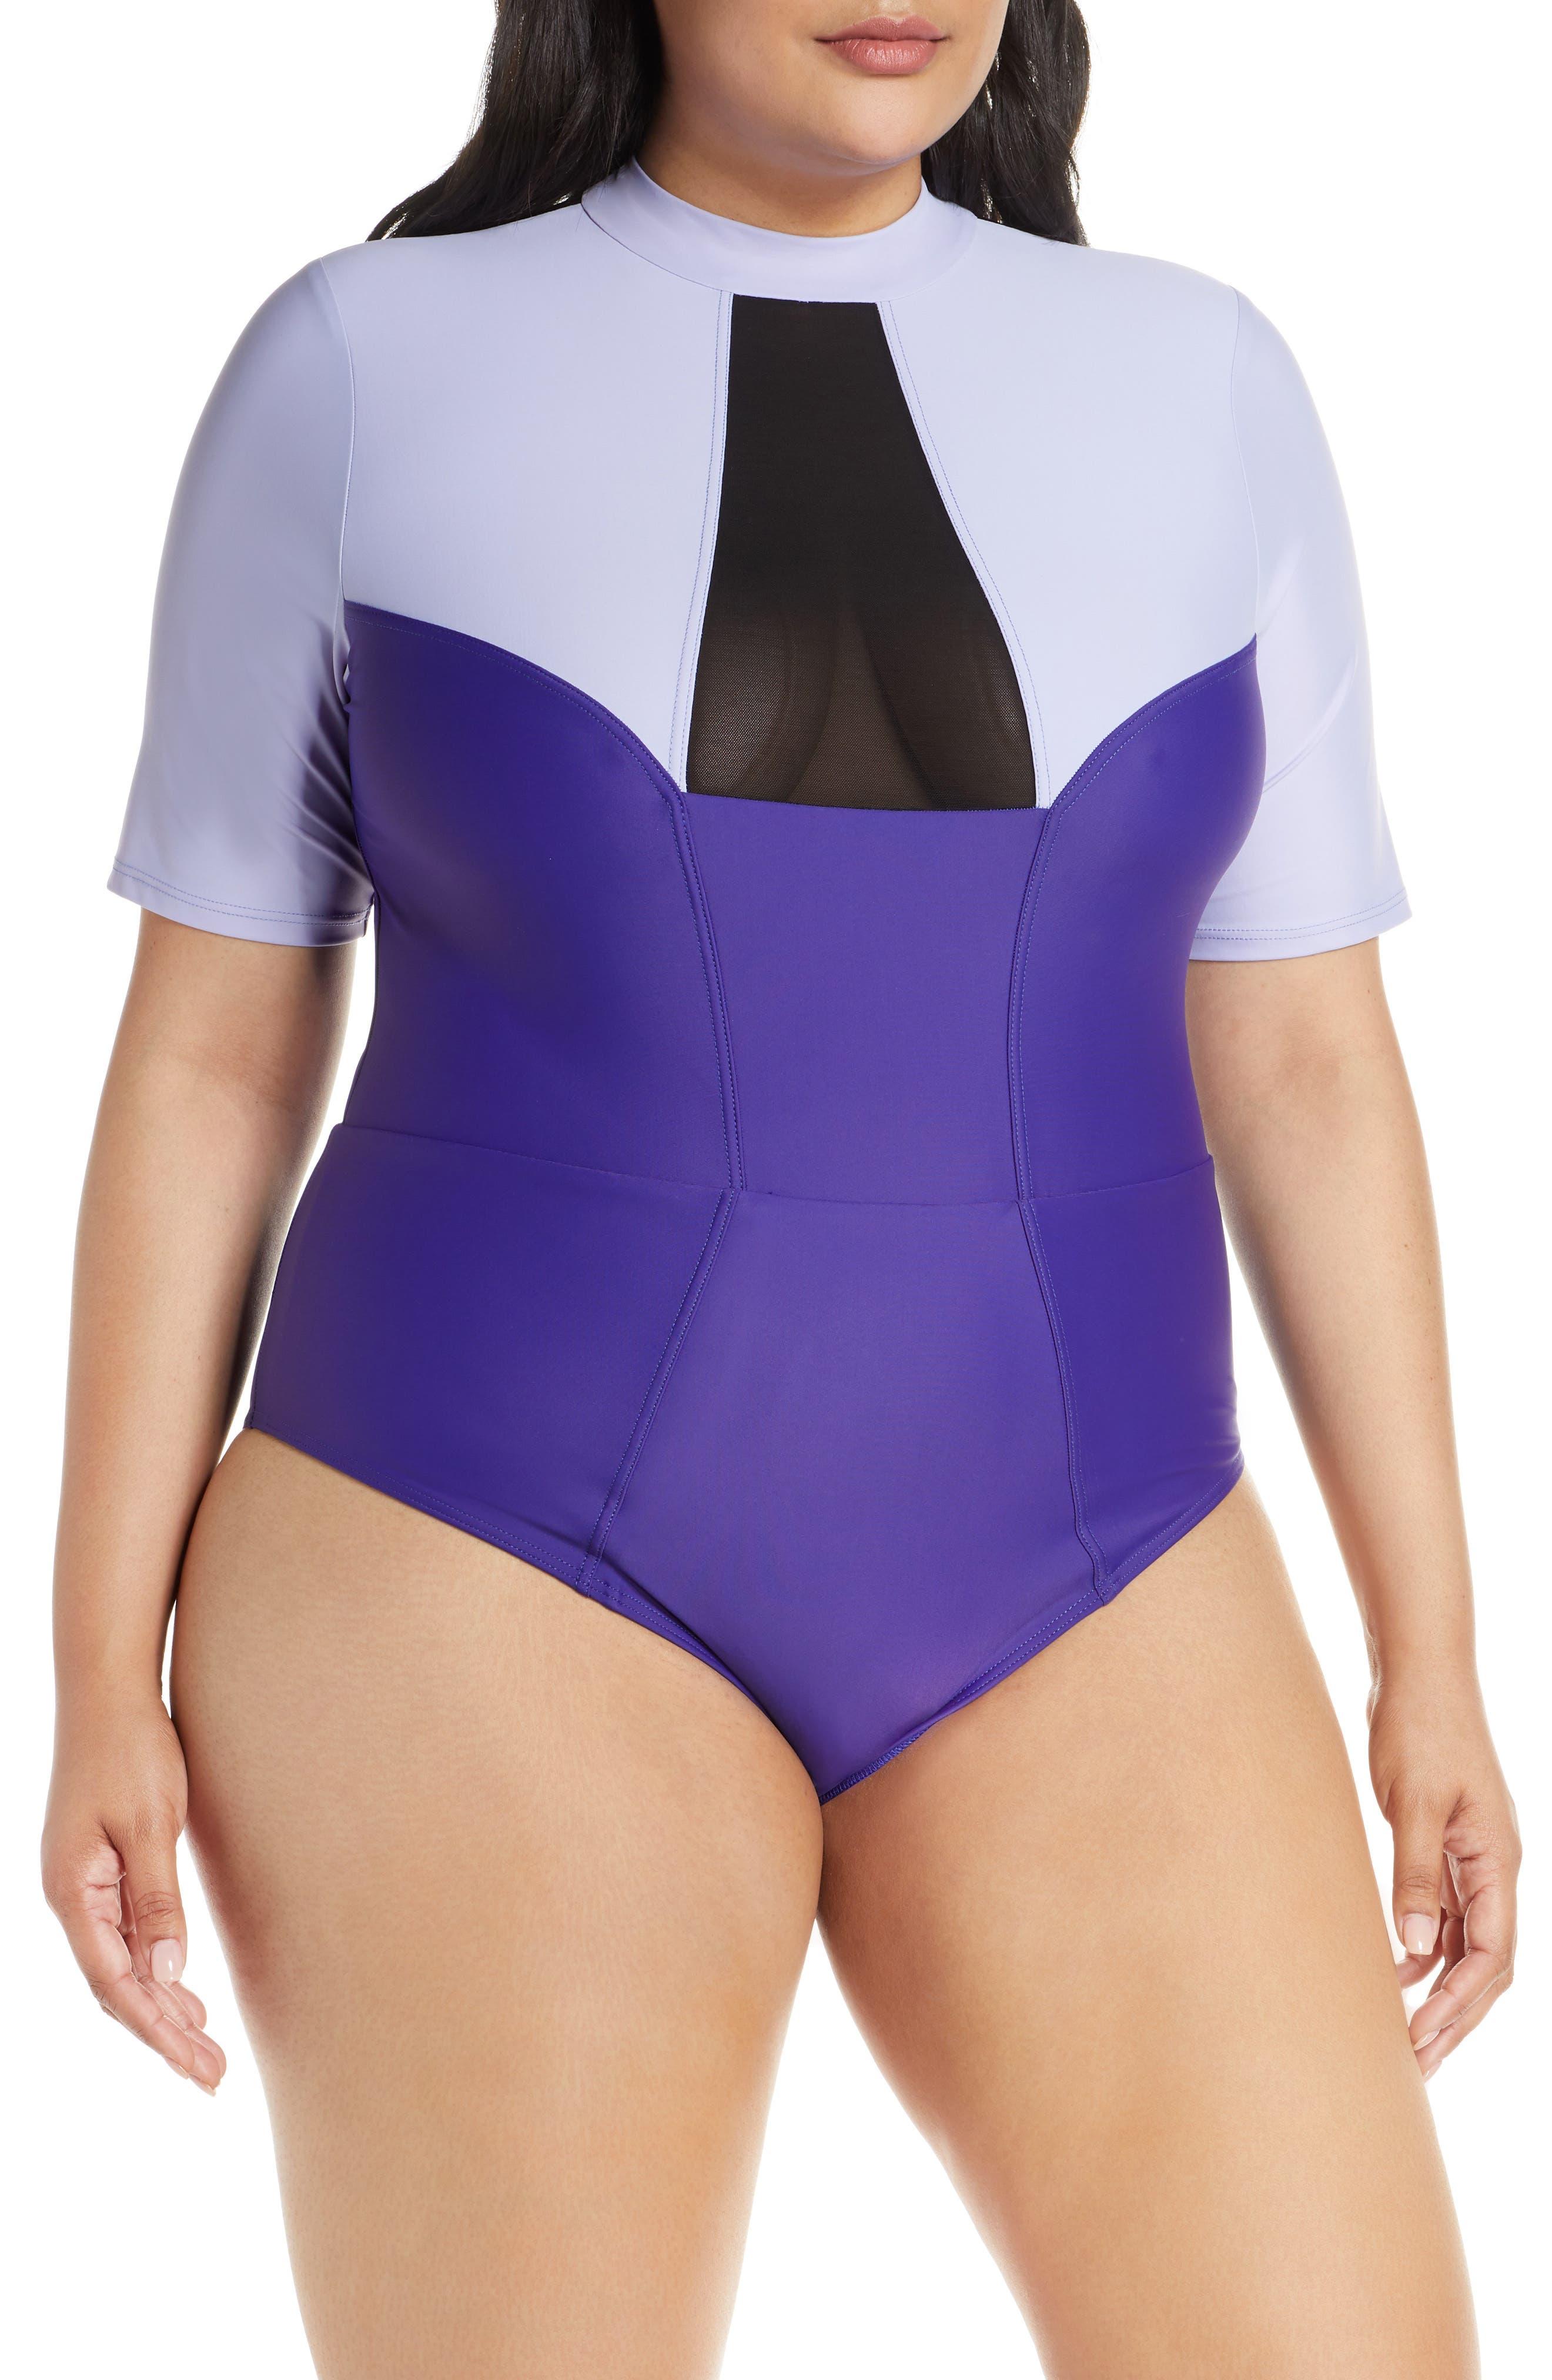 Plus Size Chromat Tidal Ii Ilusion Detail One-Piece Swimsuit, Purple